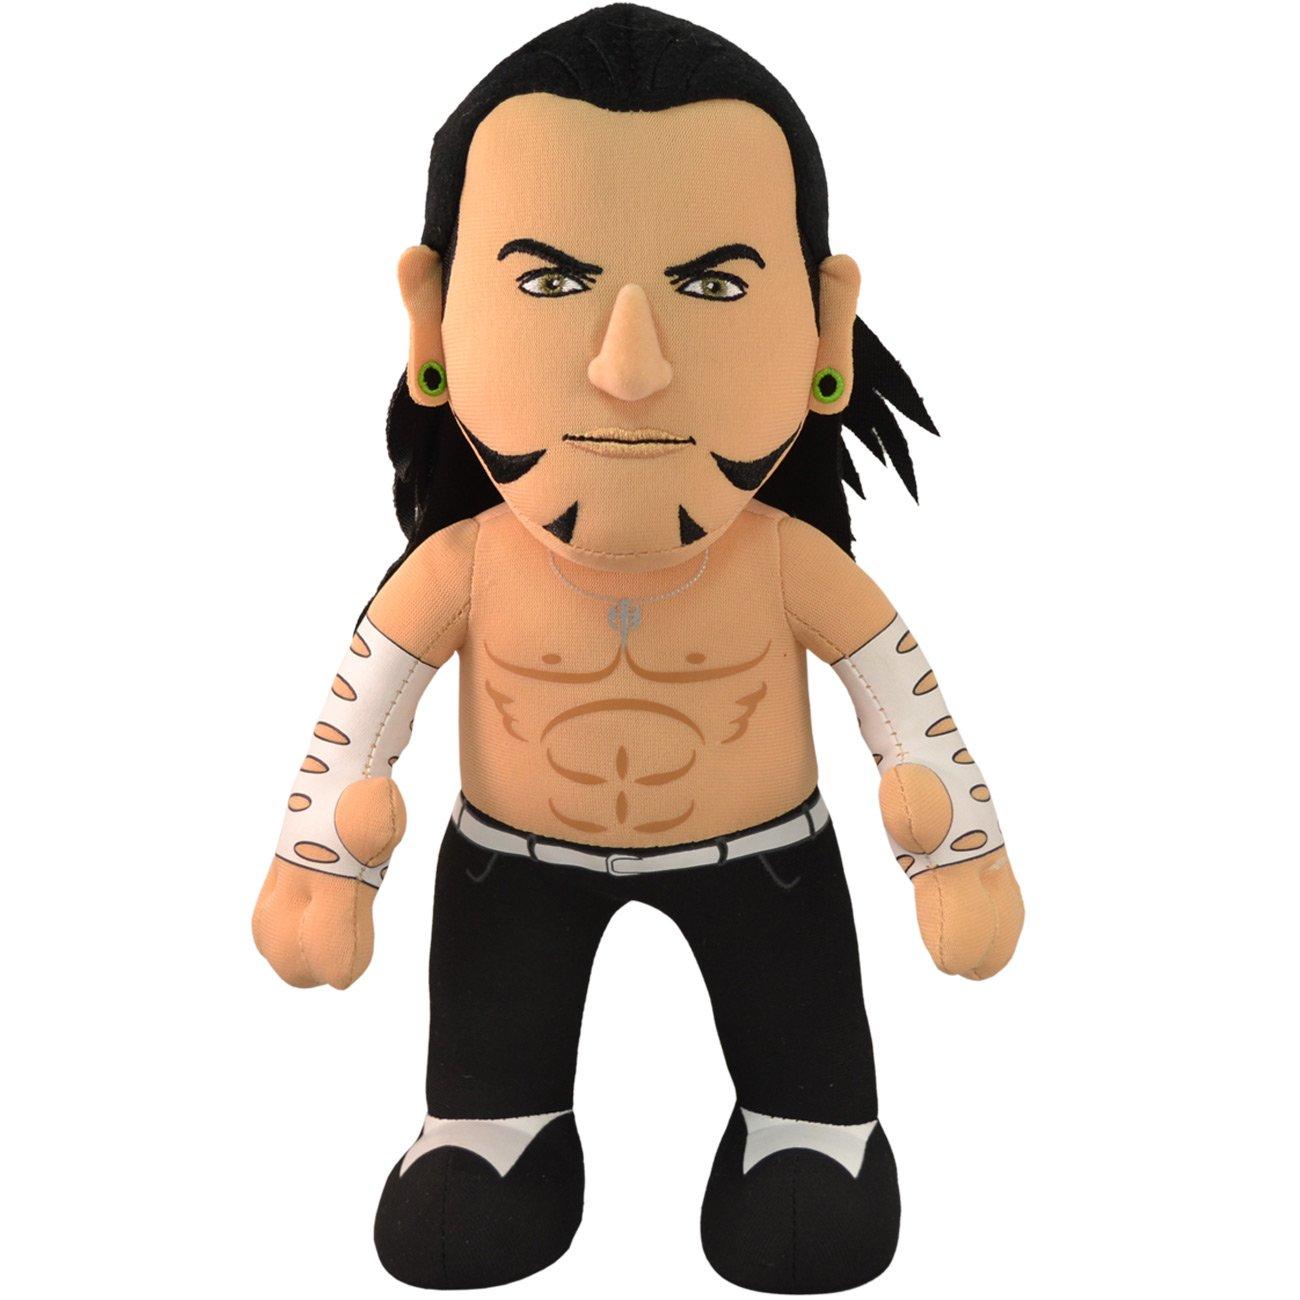 "WWE Old School The Rock 10"" Plush Figure"